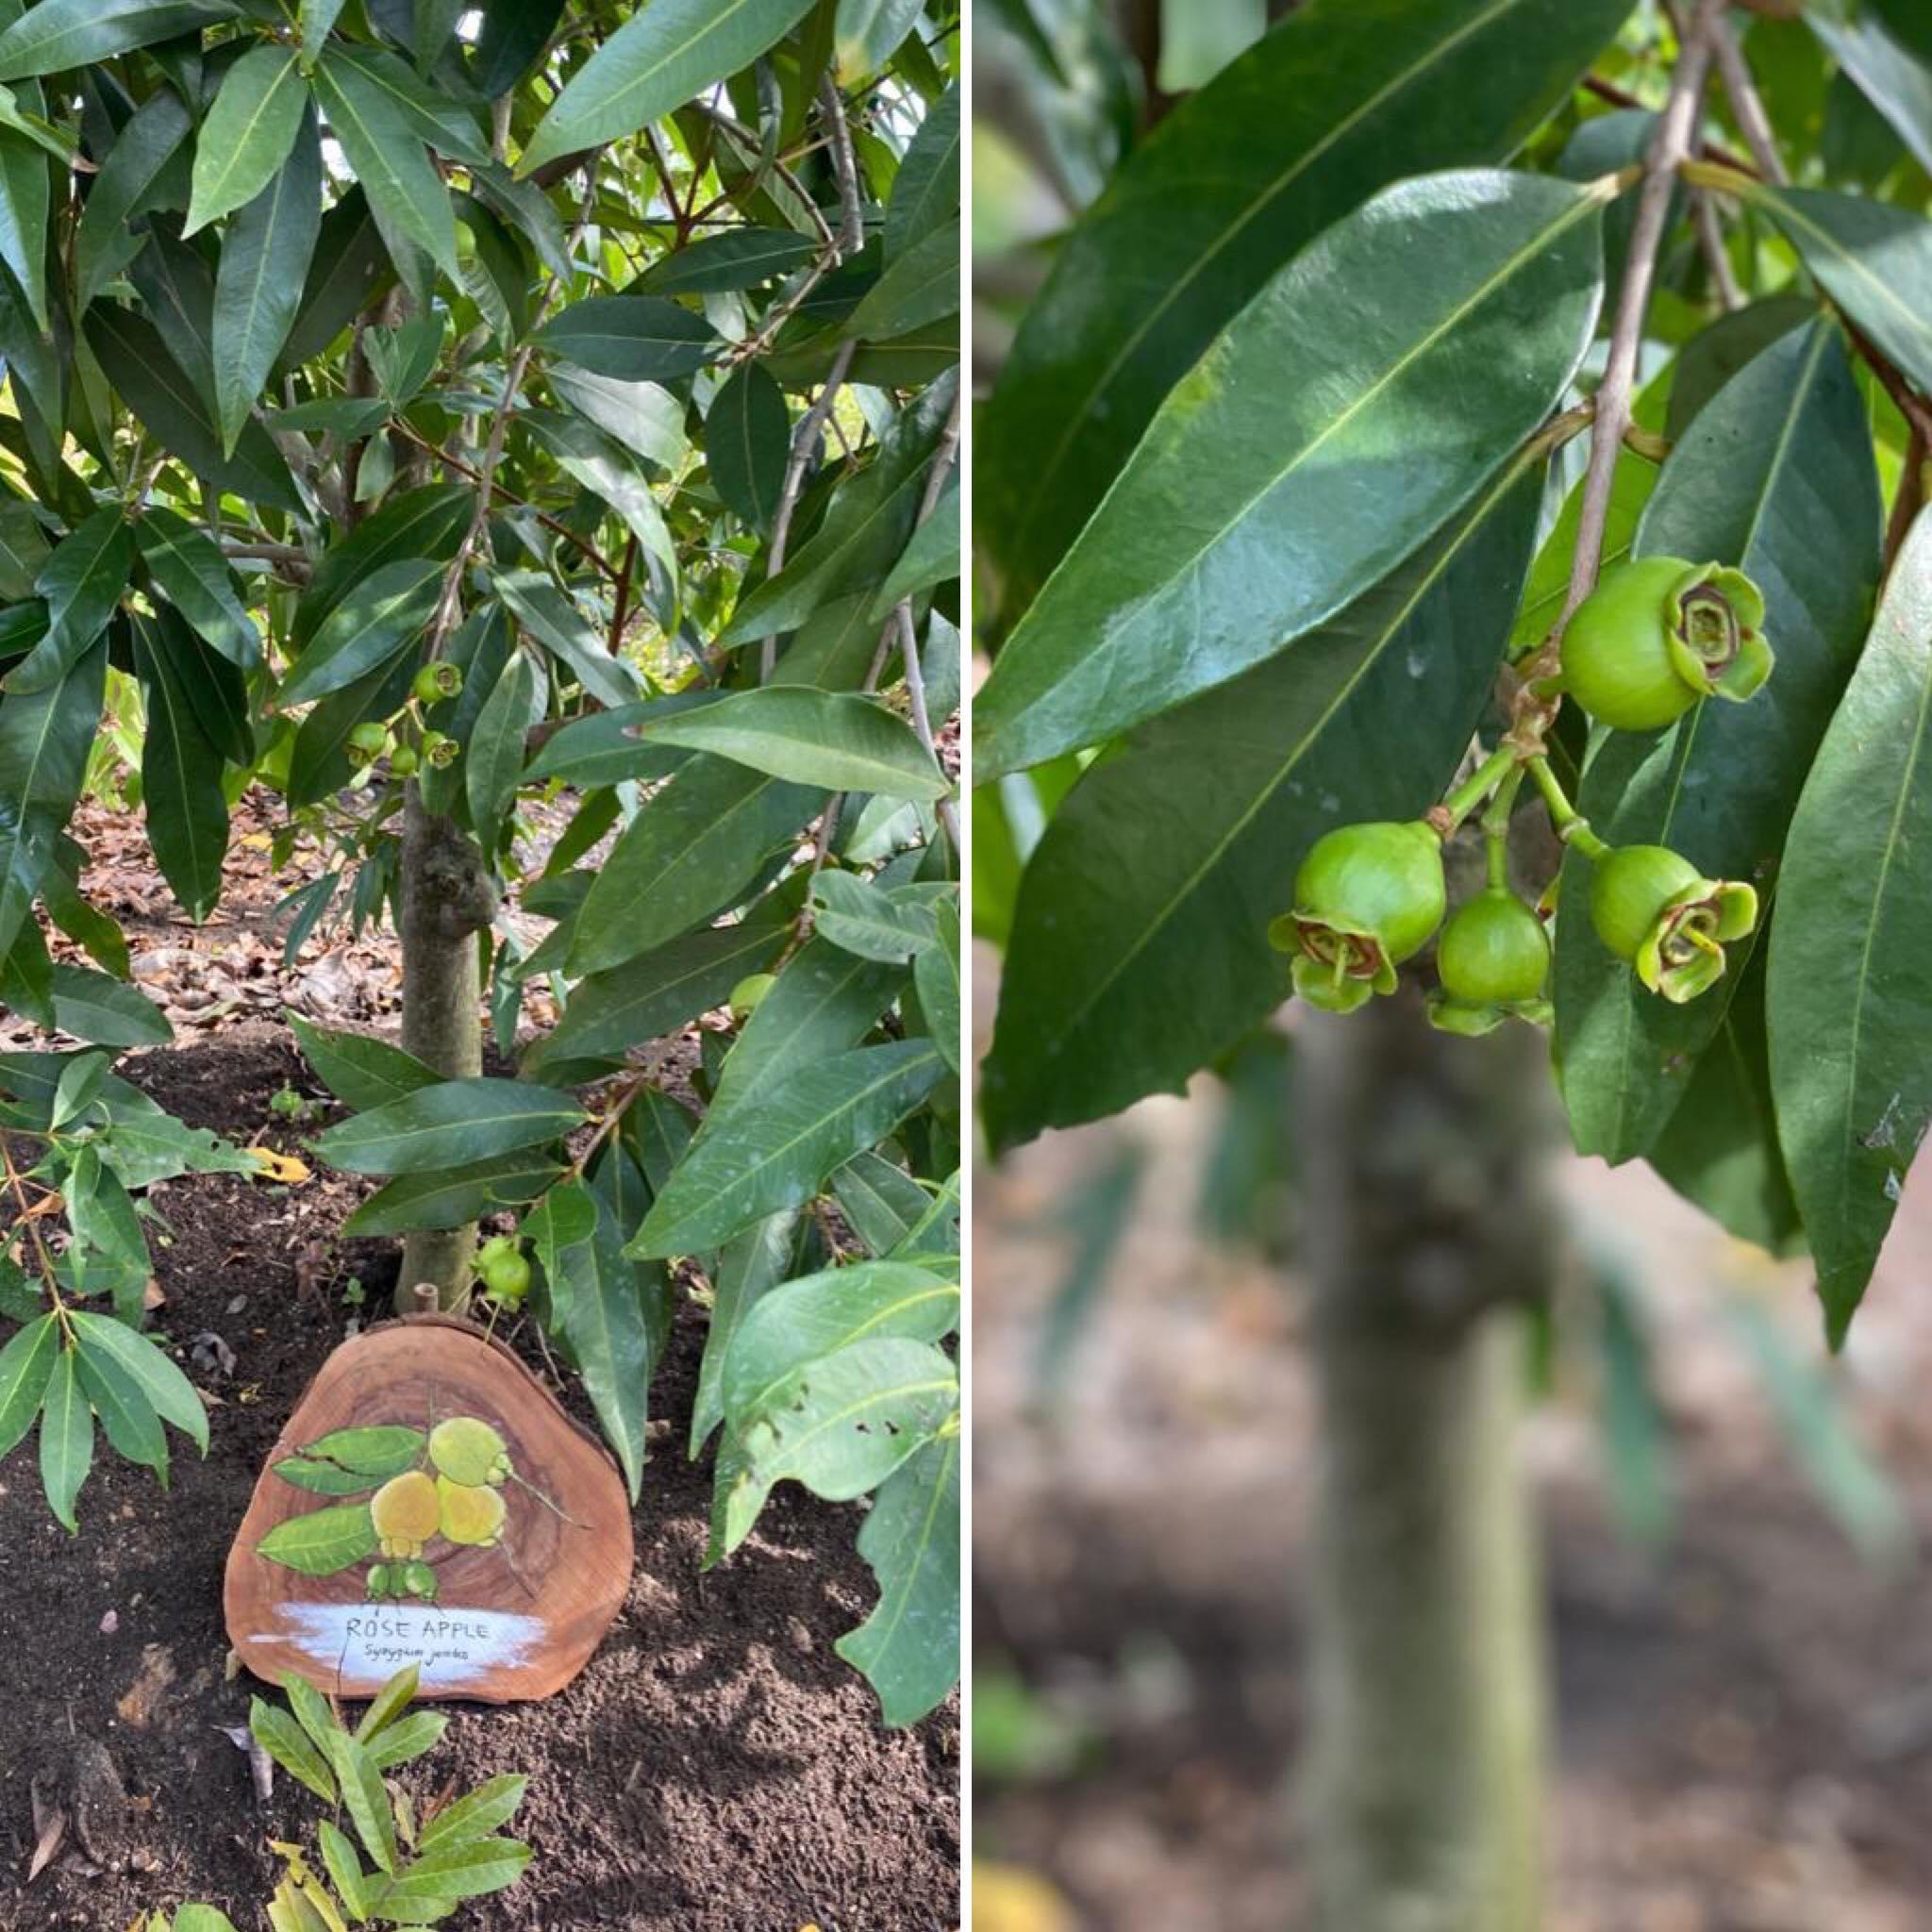 玫瑰苹果 khaw boon wan.jpg